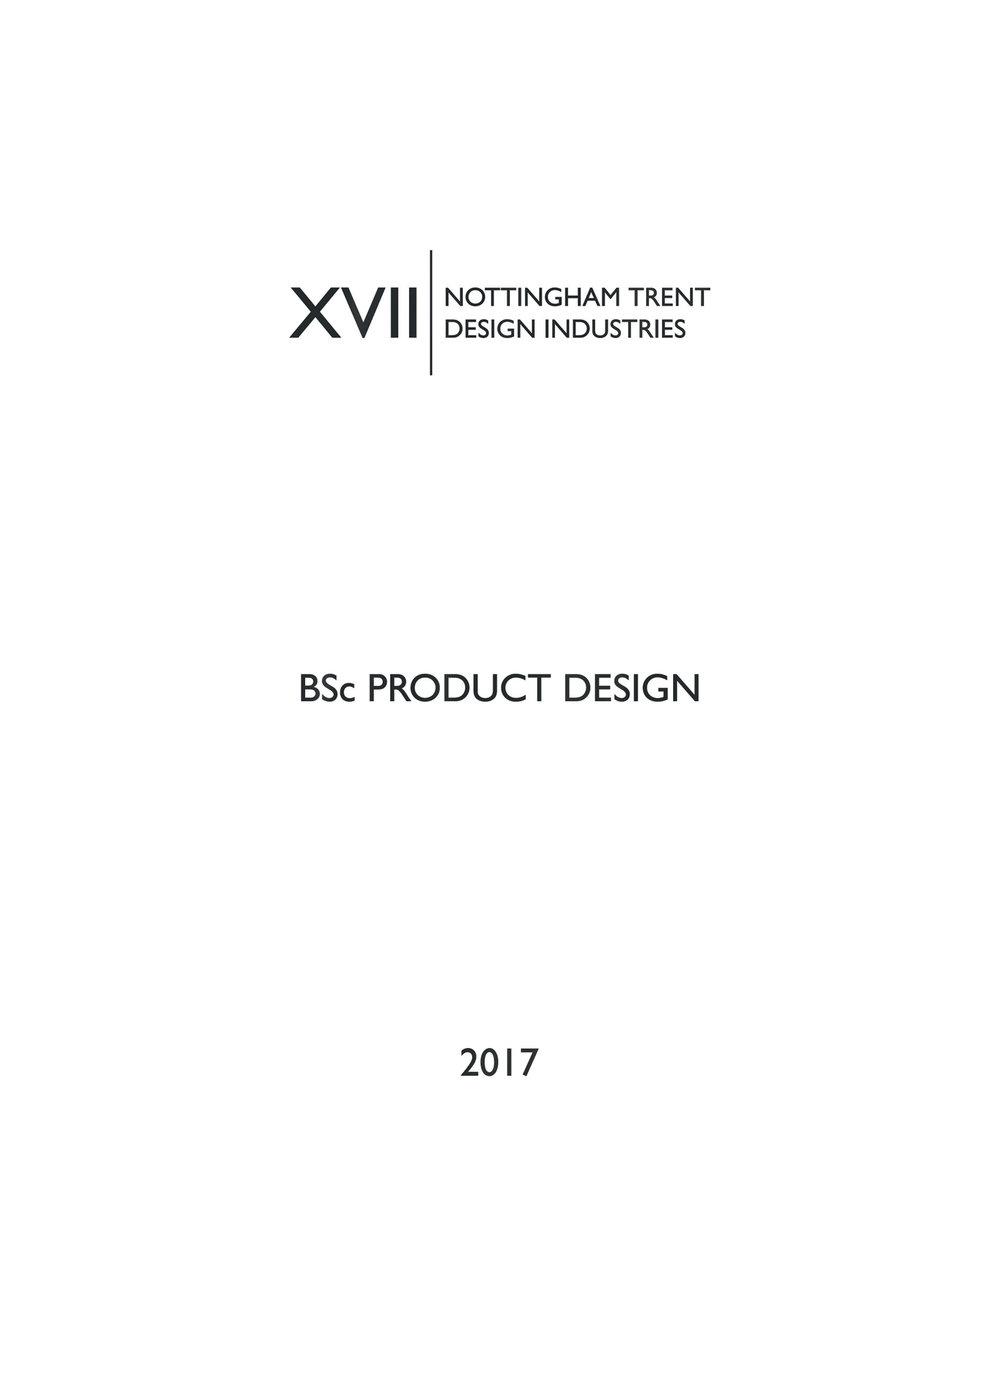 BSc Product Design - Brochure - NTU Degree Show 2017-73.jpg